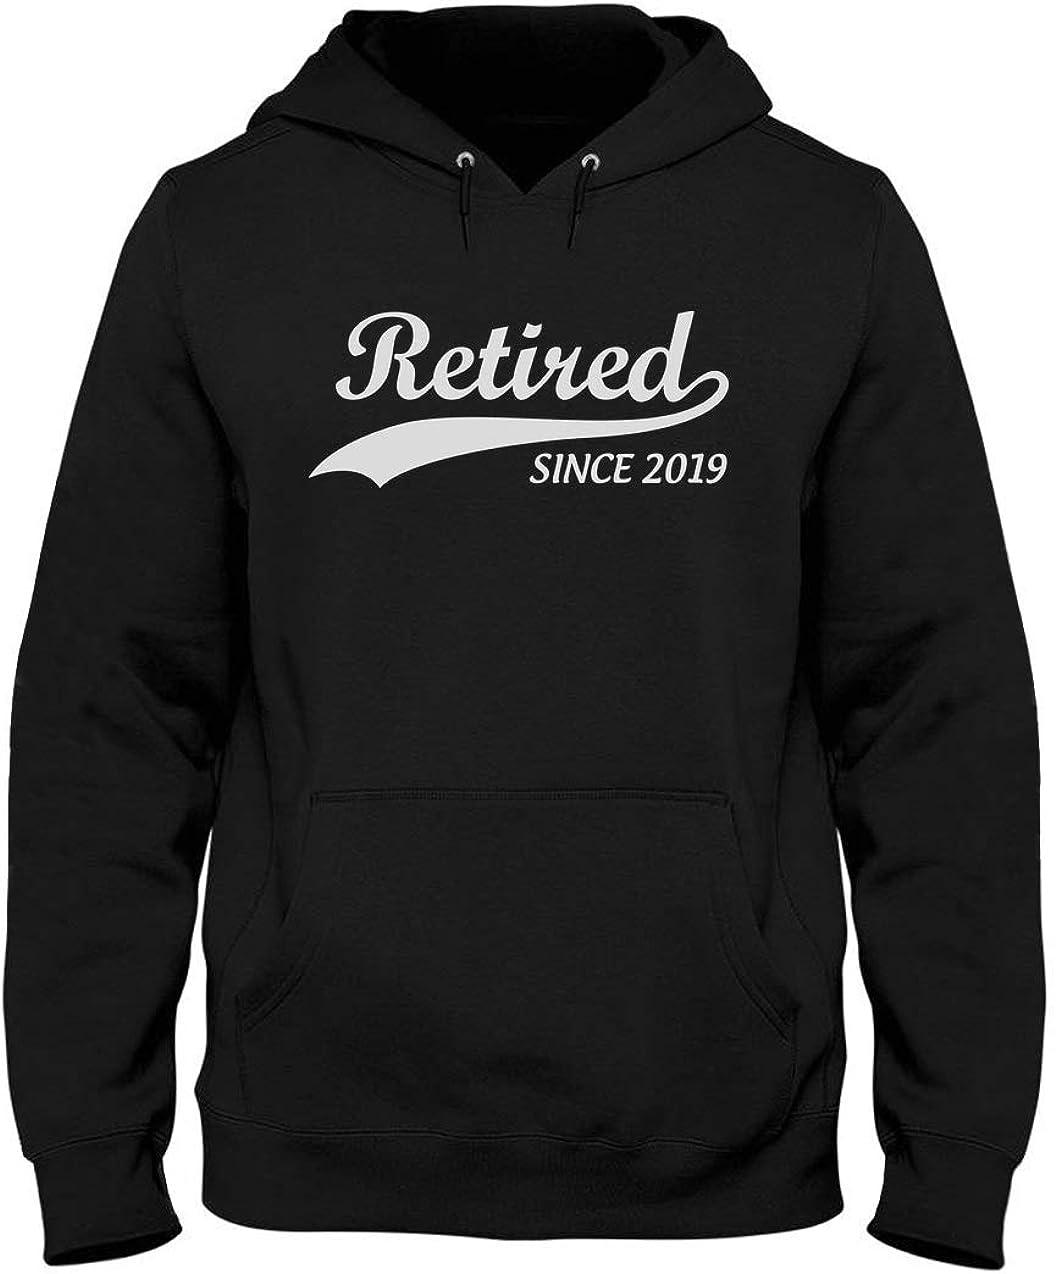 Green Turtle T-Shirts Sudadera con Capucha para Hombre - Retired Since 2019 - Regalo para Jubilados 2019